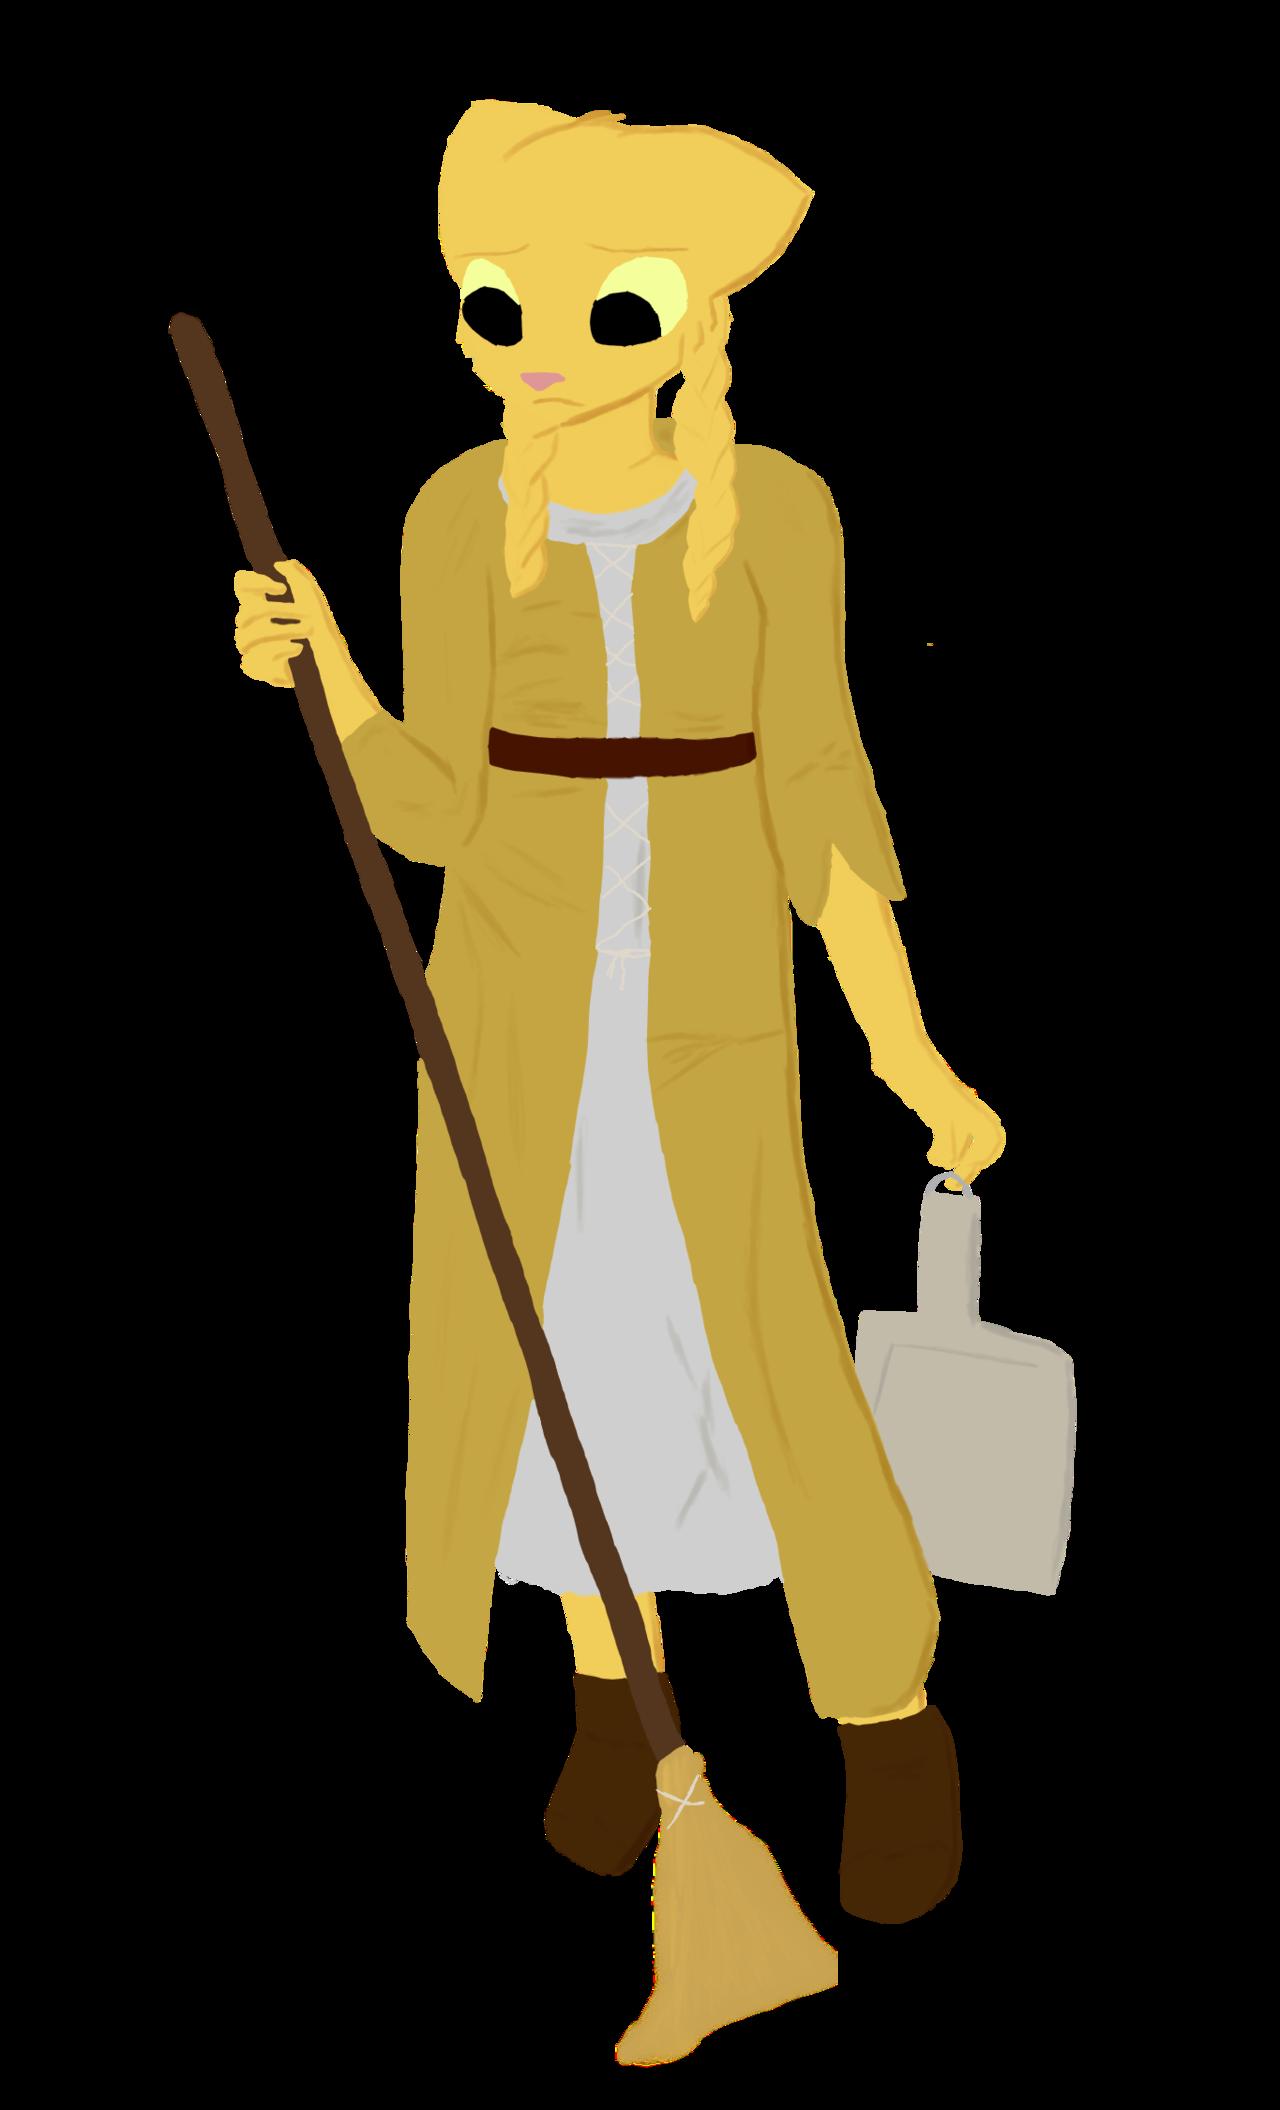 Janitor broom